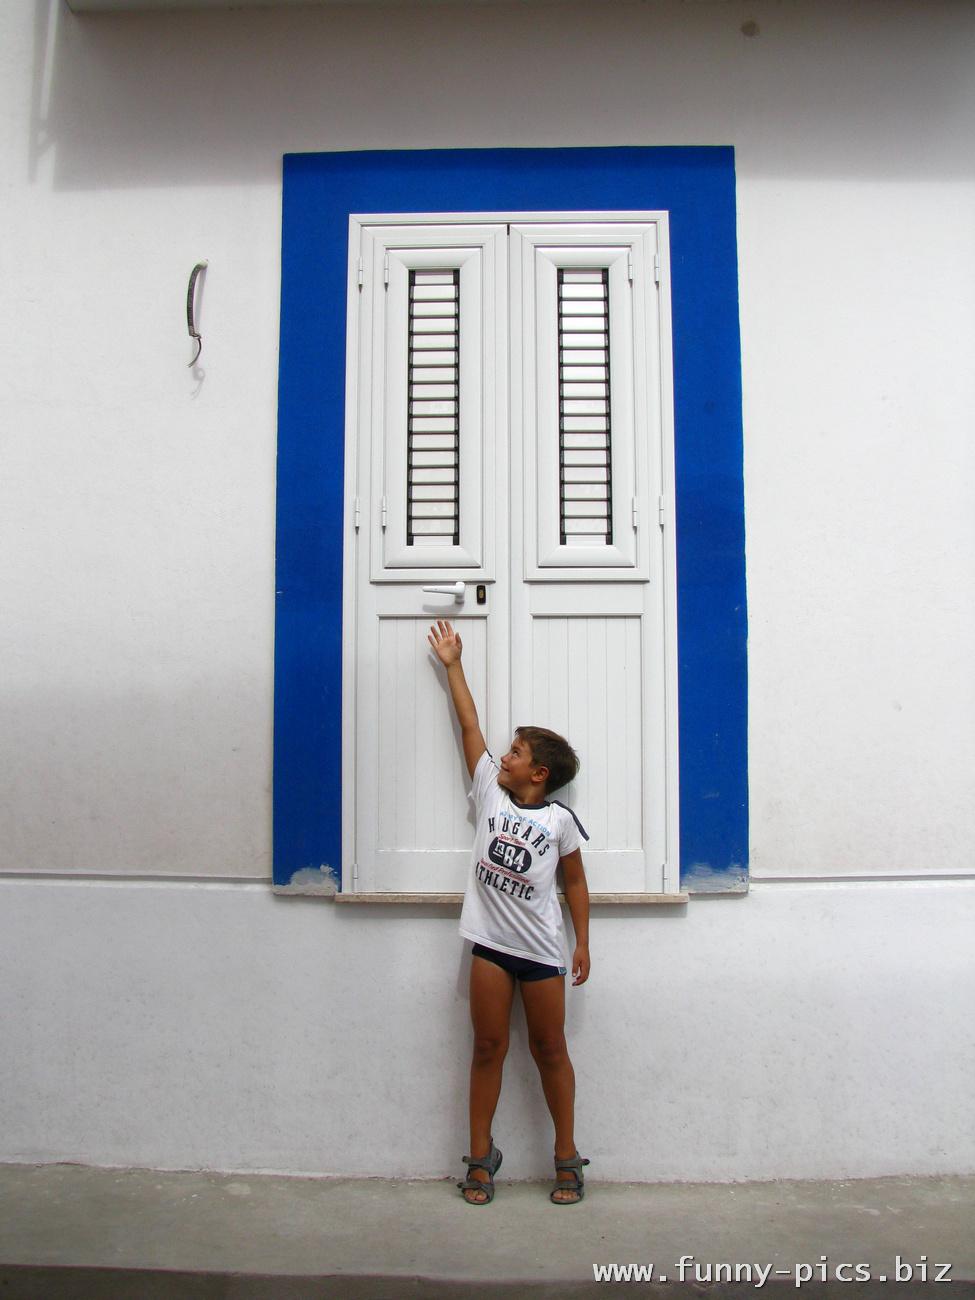 Home Design Failures: Doorstep too high